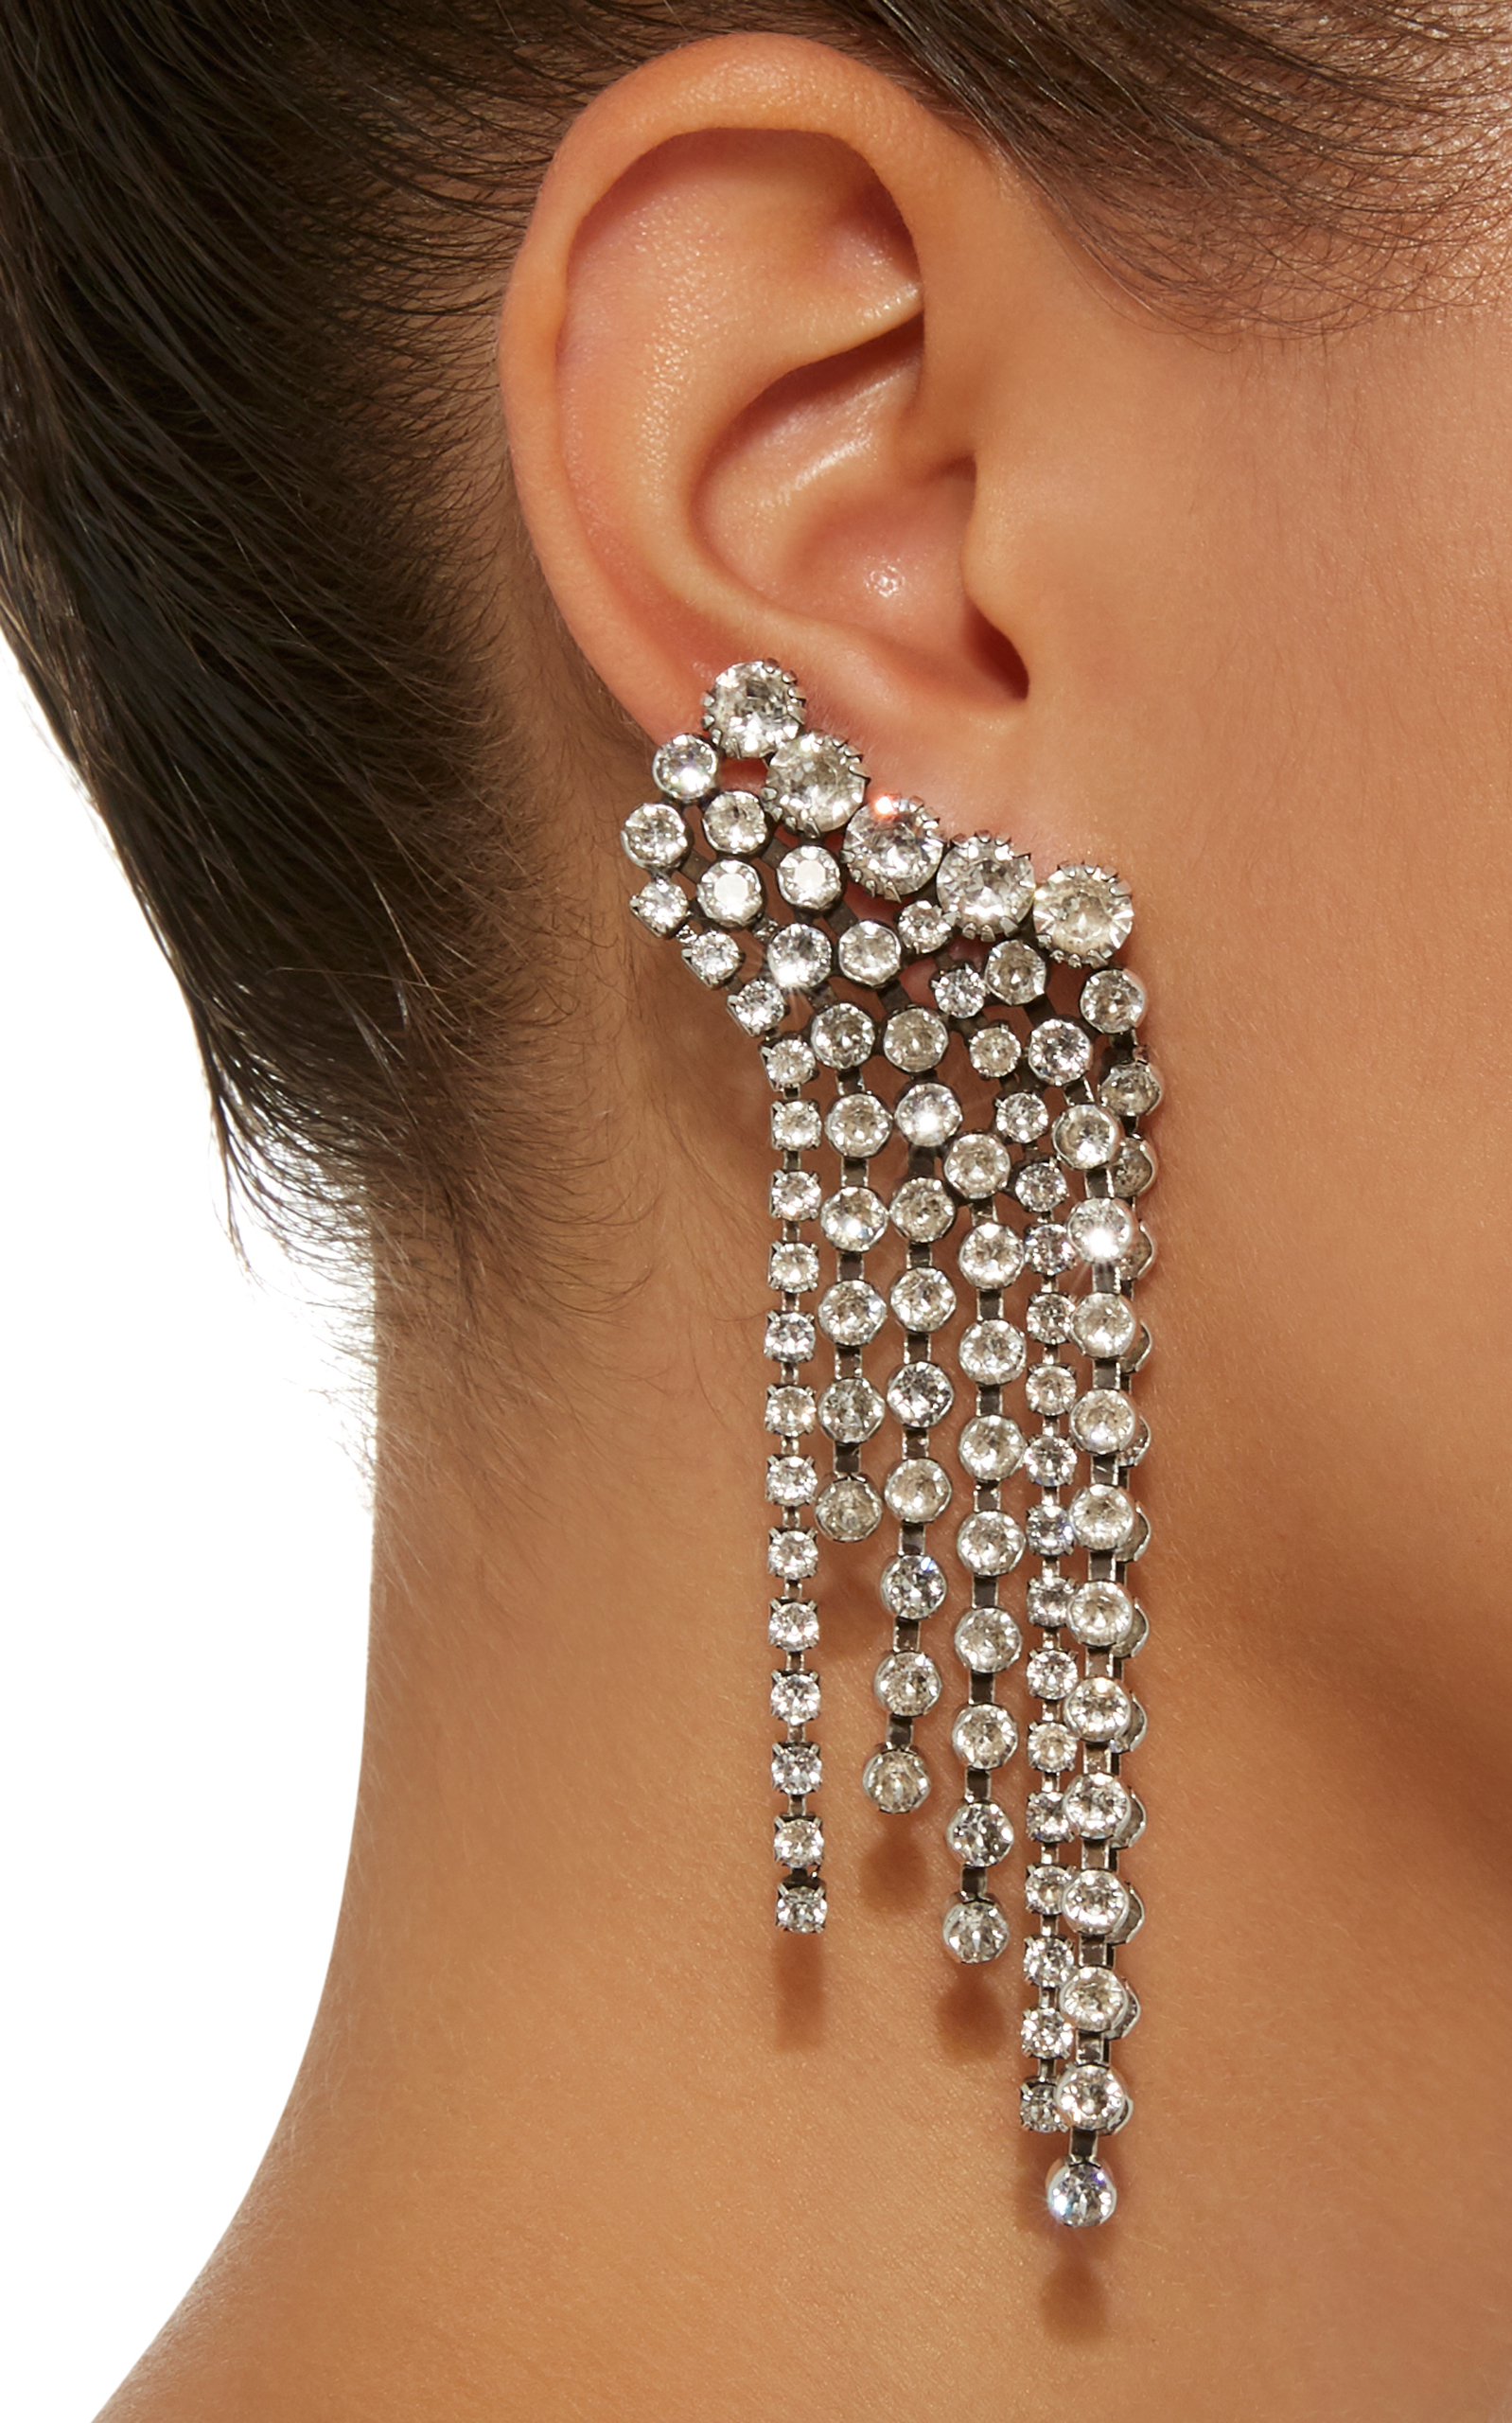 3d2955c51e0 Isabel MarantA Wild Shore Silver-Tone Crystal Earrings. CLOSE. Loading